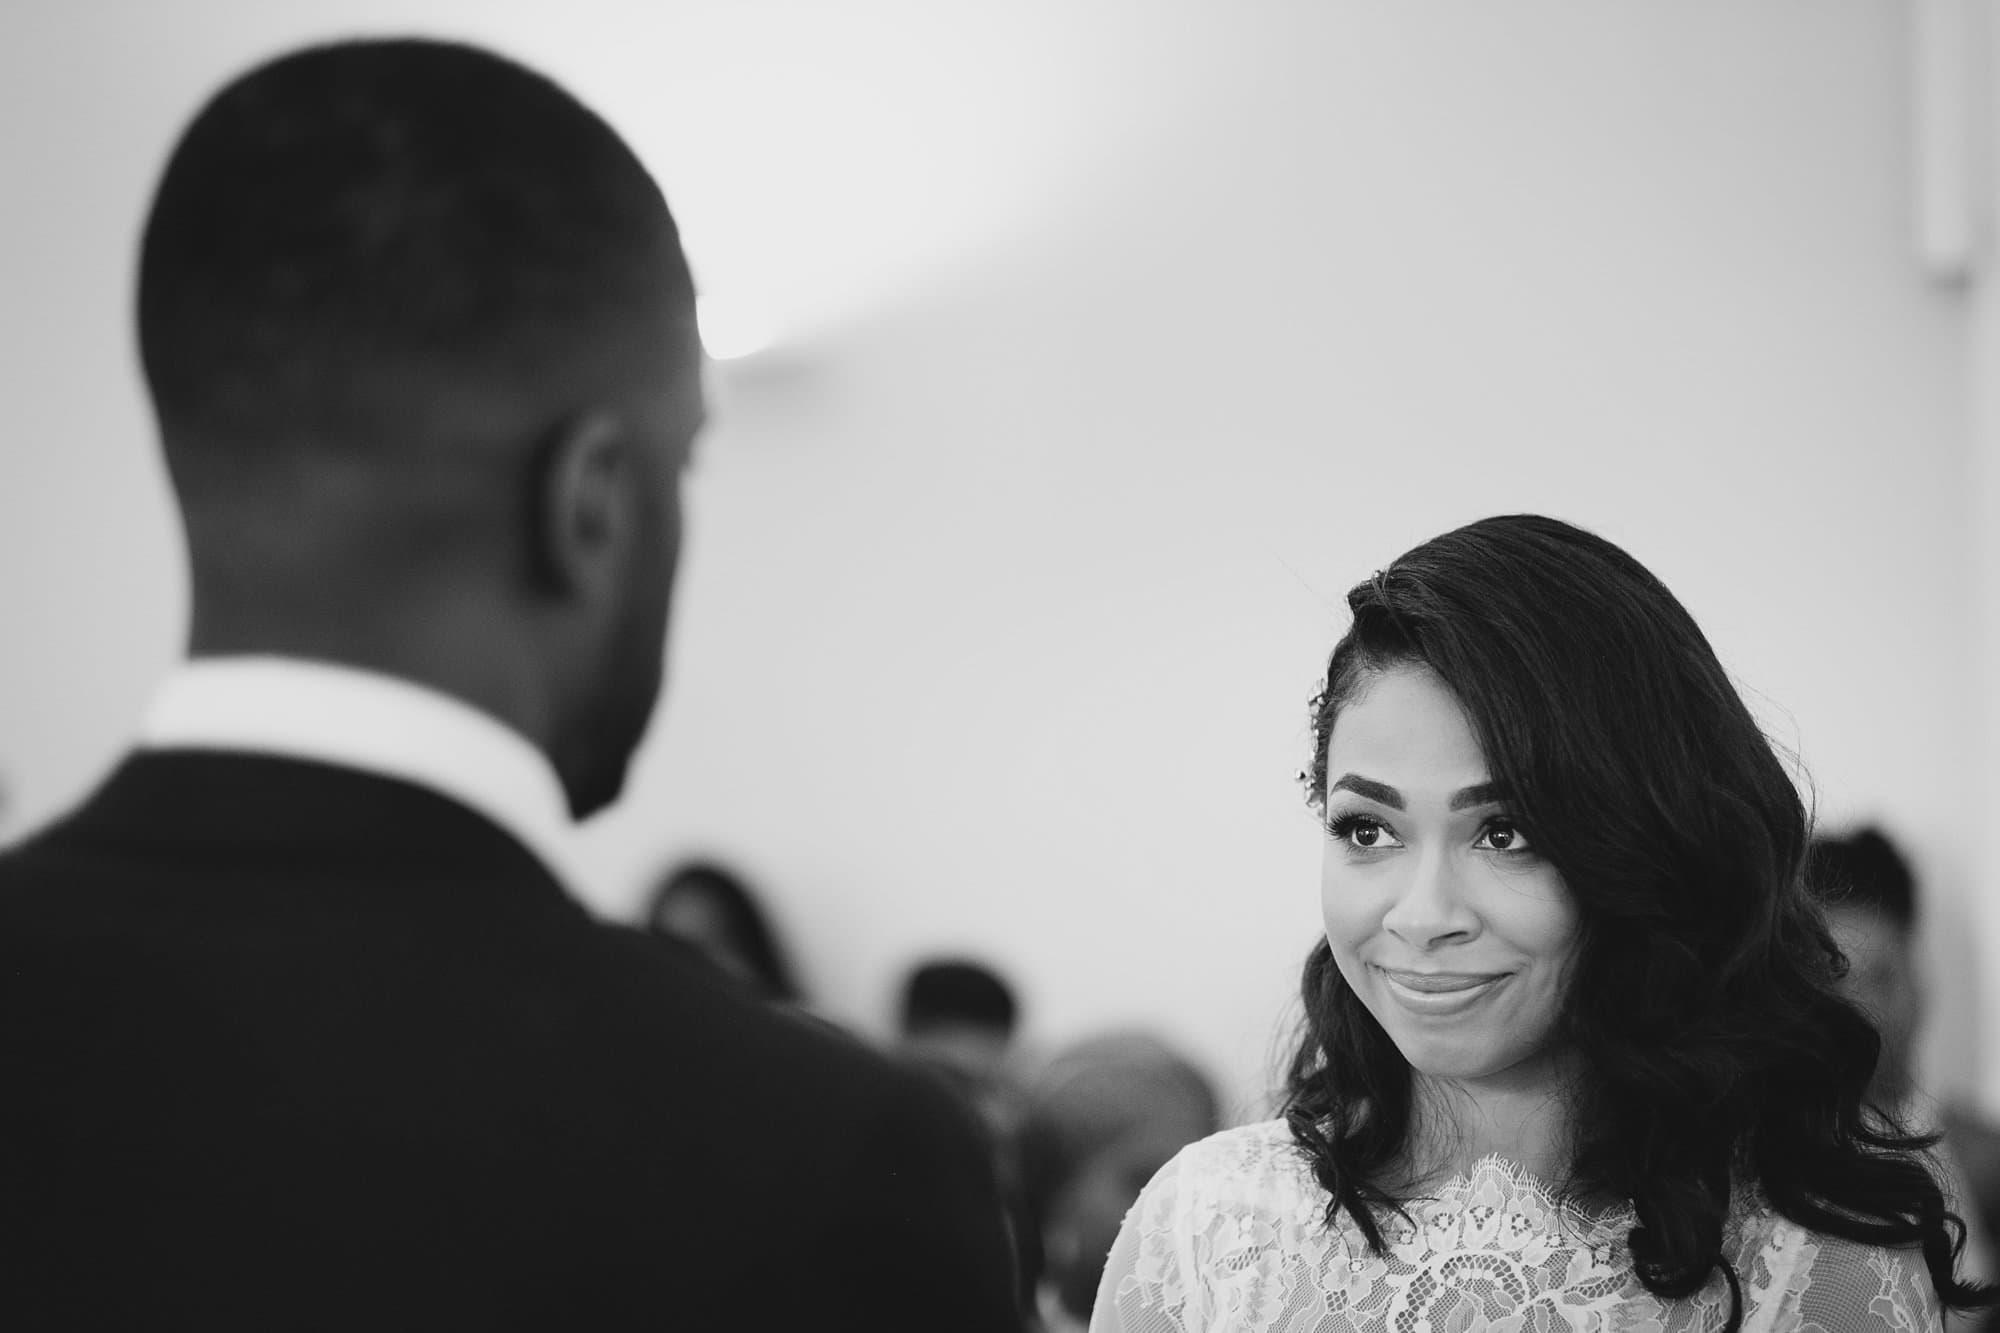 asia house london wedding photographer 021 - Rachel + Gabriel   Asia House Wedding Photography